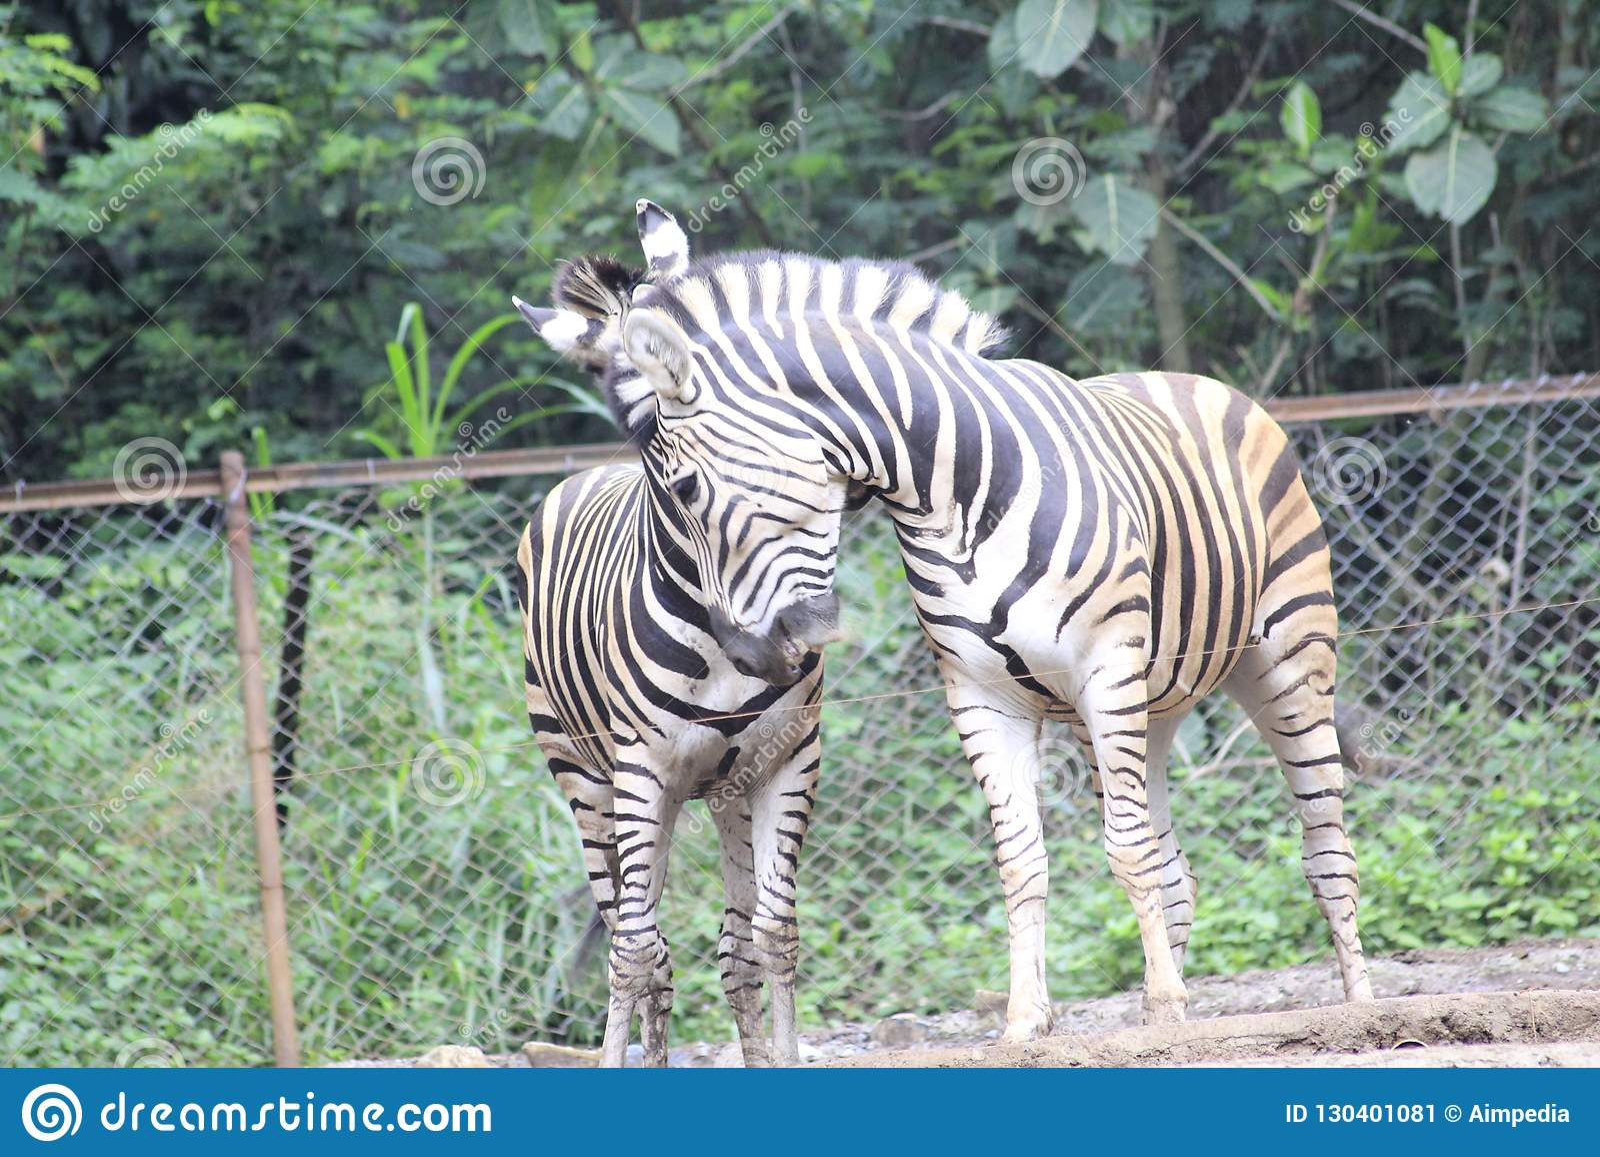 Zebra am Zoo Bandung Indonesien 4